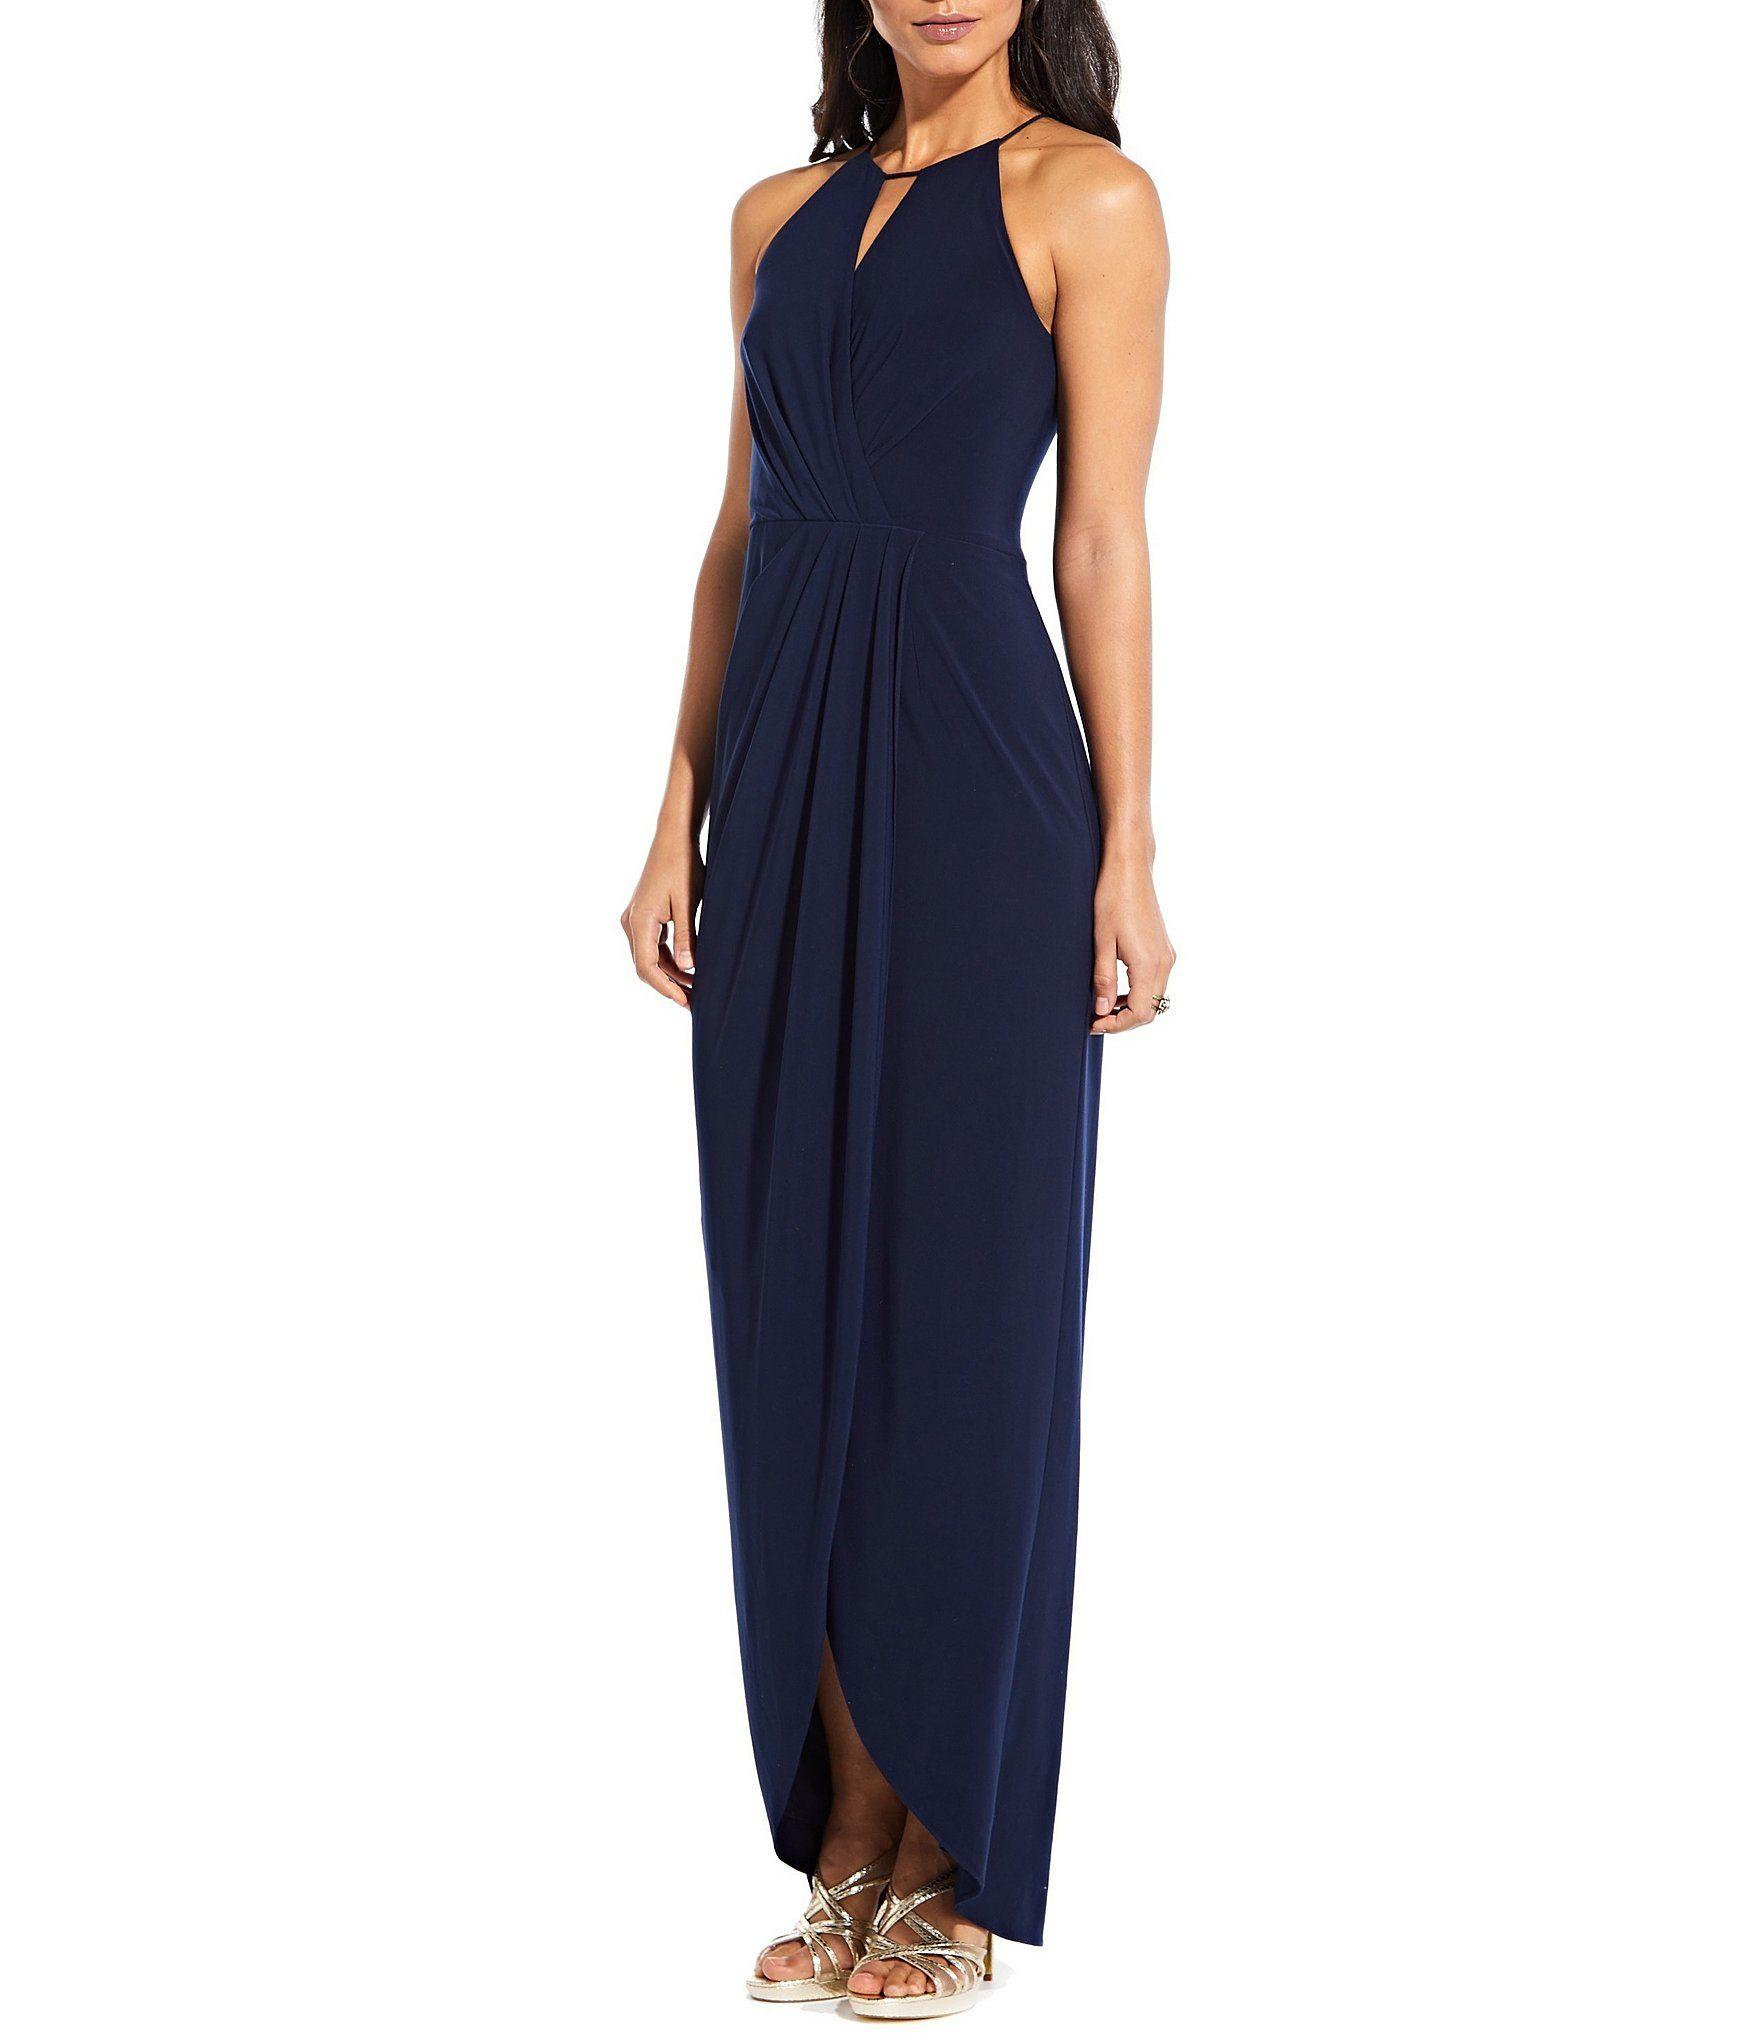 Sequin Lace Illusion Gown Dresses Clothing Women Stein Mart Gowns Dresses Clothes For Women Dresses [ 1250 x 1000 Pixel ]